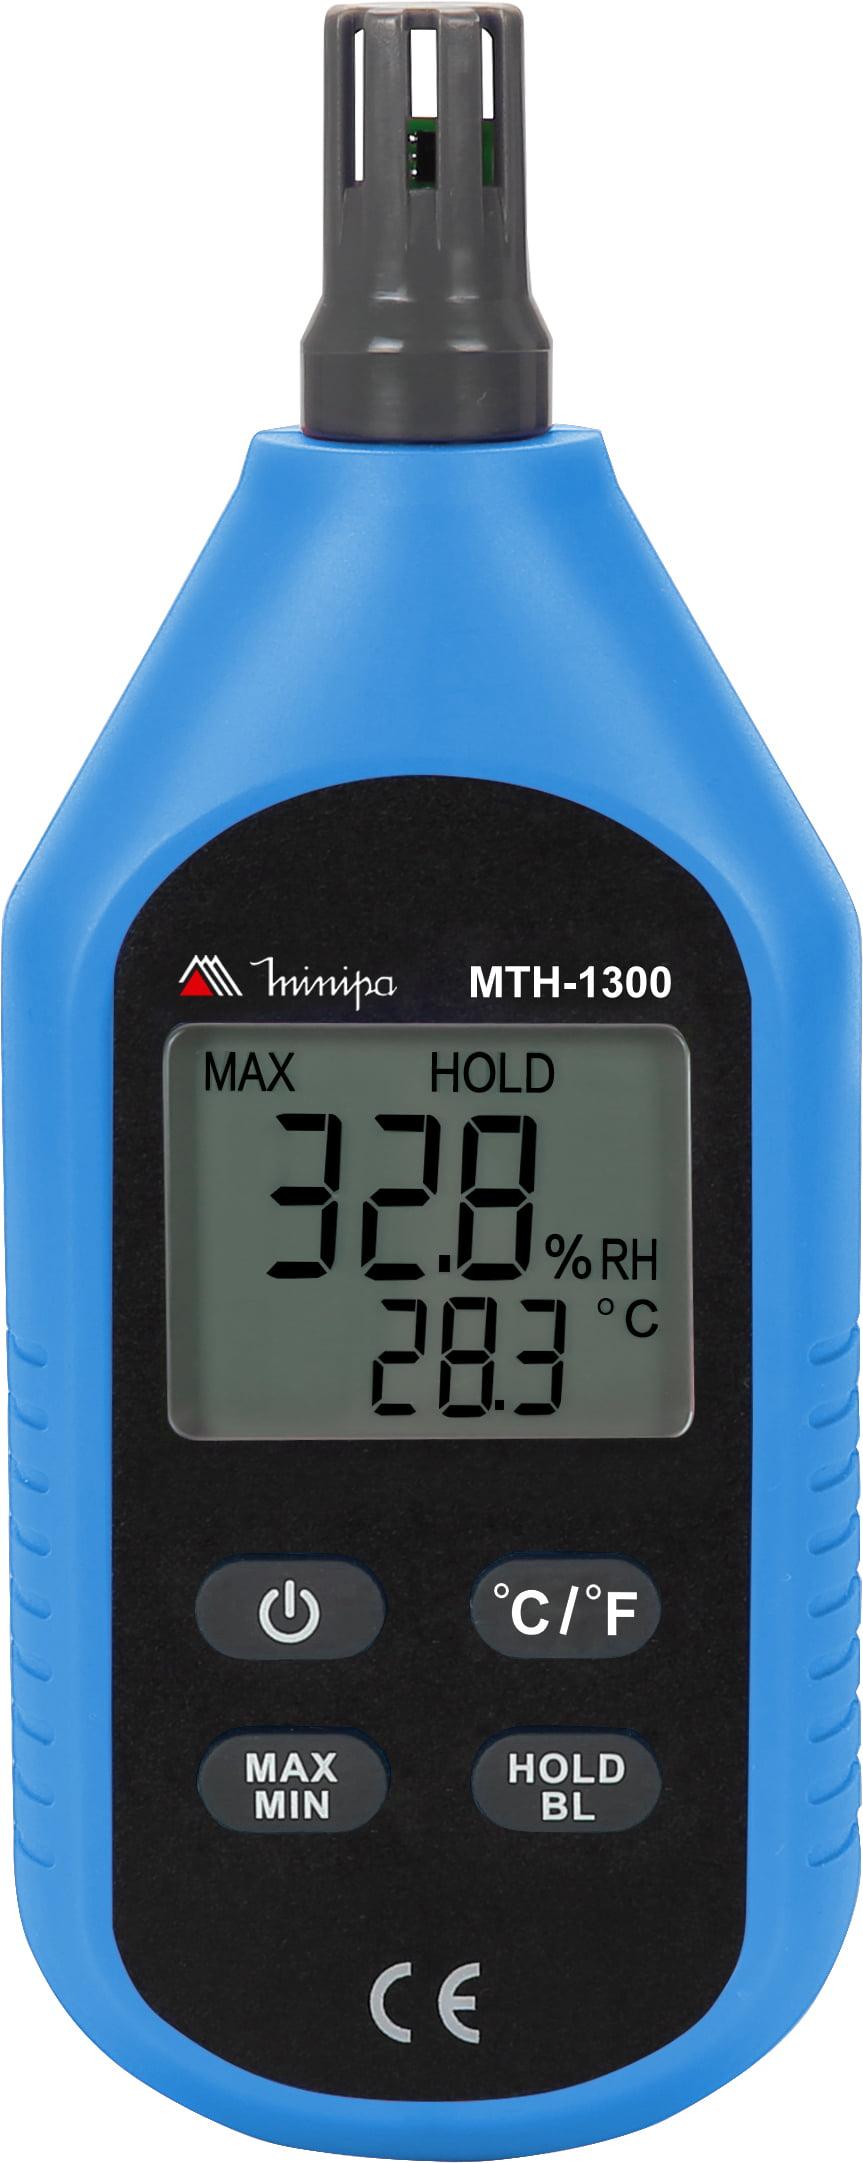 MINI TERMO-HIGRÔMETRO MINIPA - MTH-1300